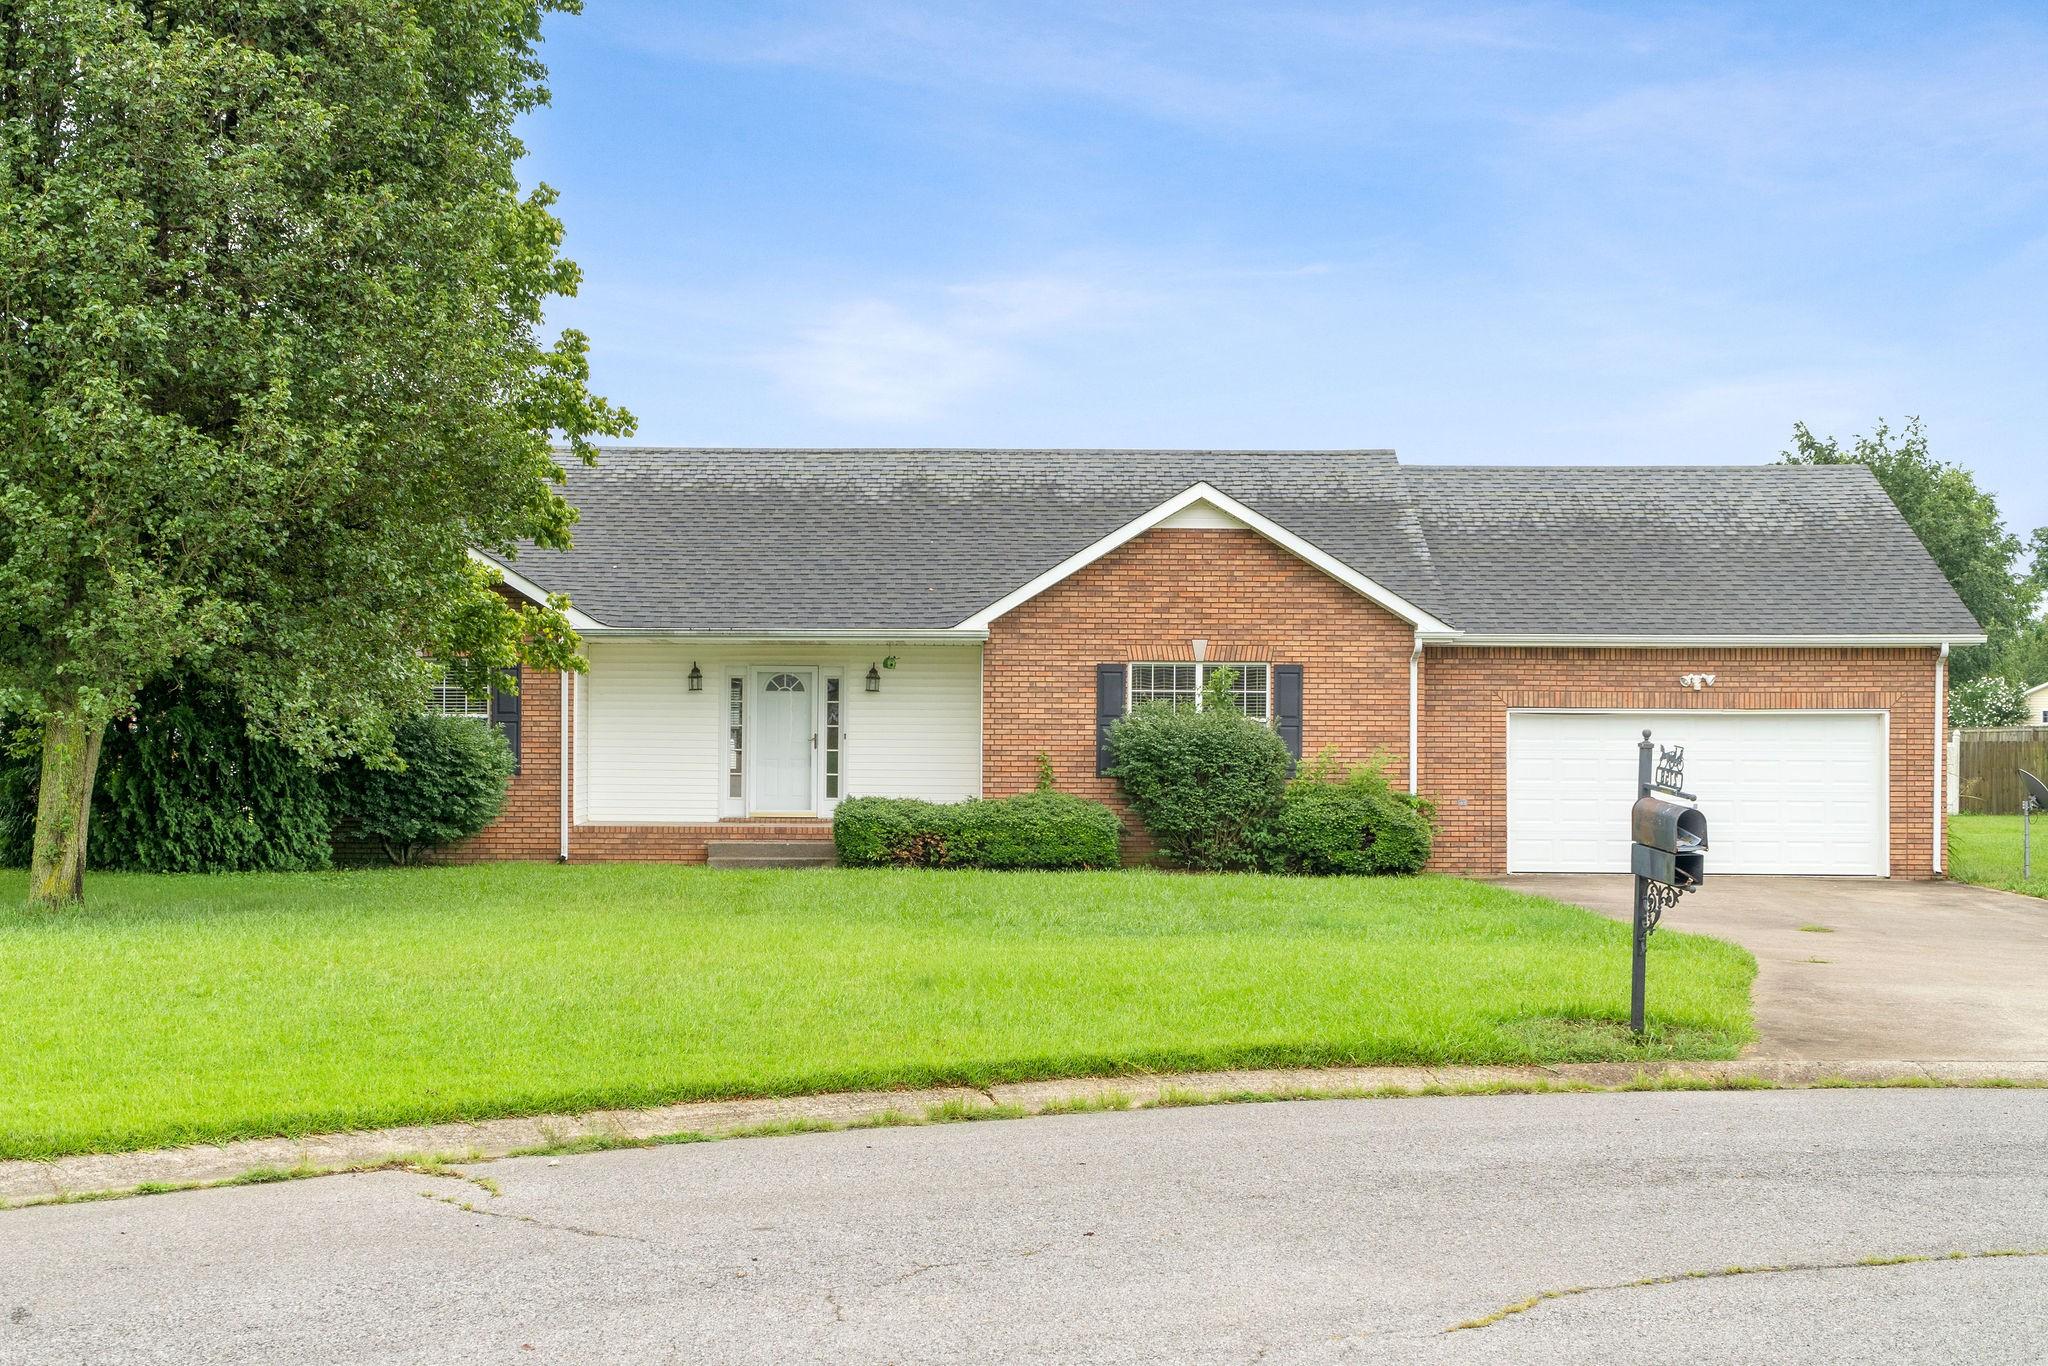 2758 Shepherds Ct Property Photo - Woodlawn, TN real estate listing